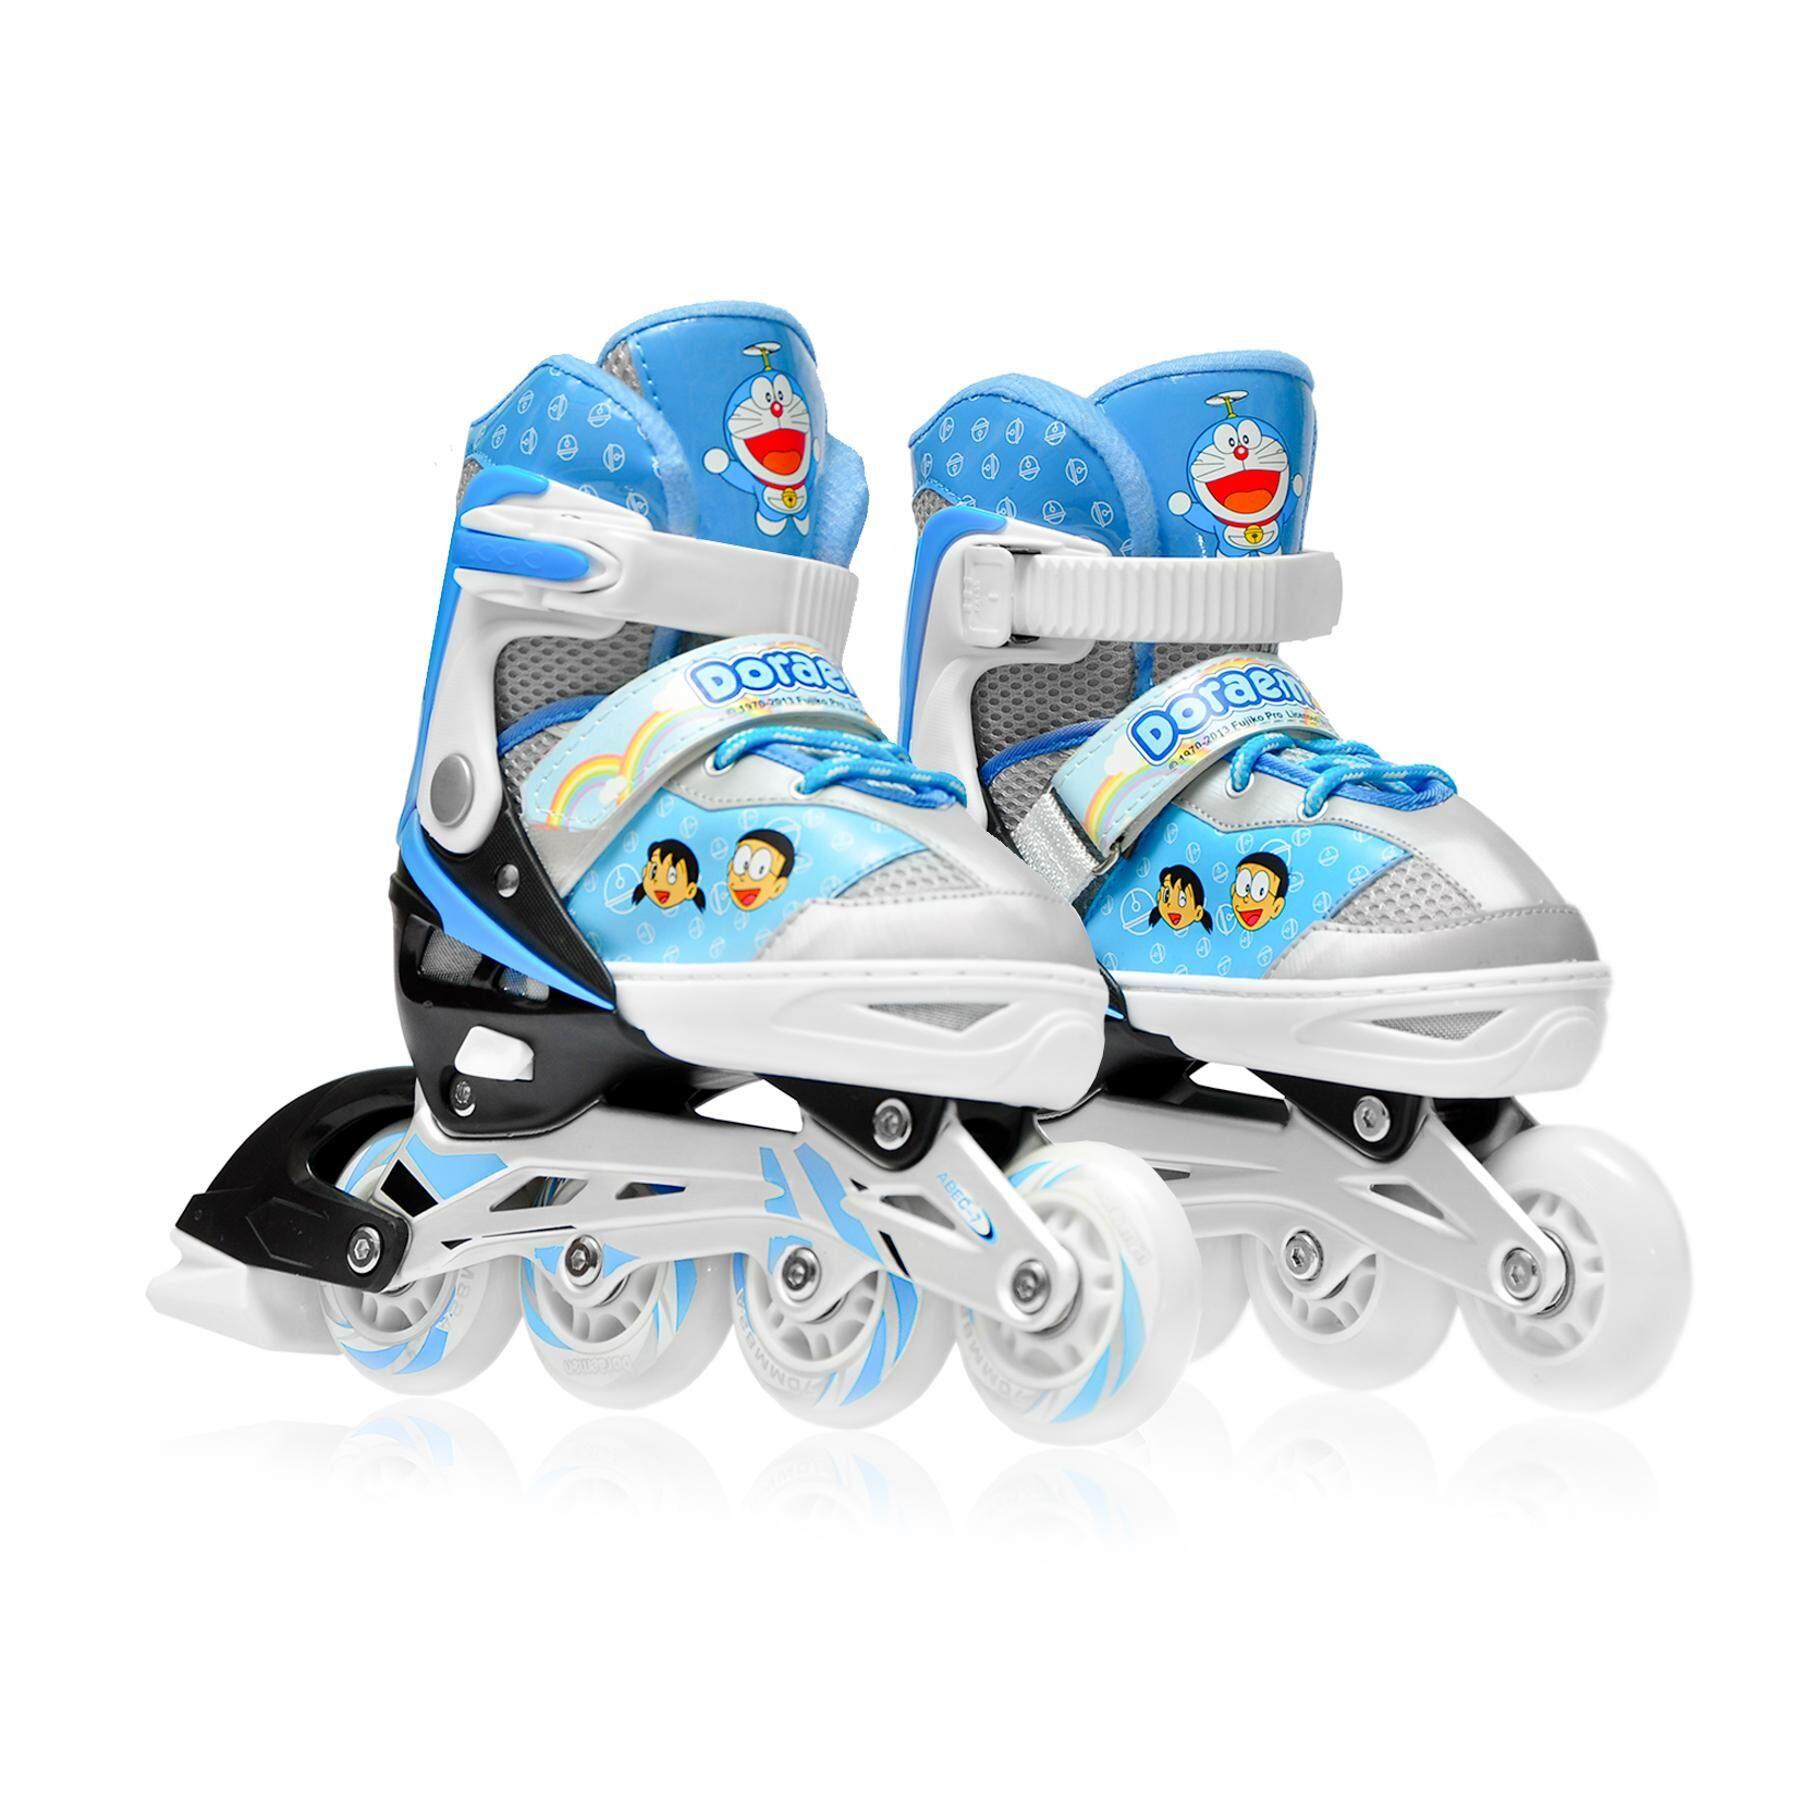 Doraemon รองเท้าอินไลน์สเก็ต โดราเอมอน   Inline Skate Doraemon (blue).